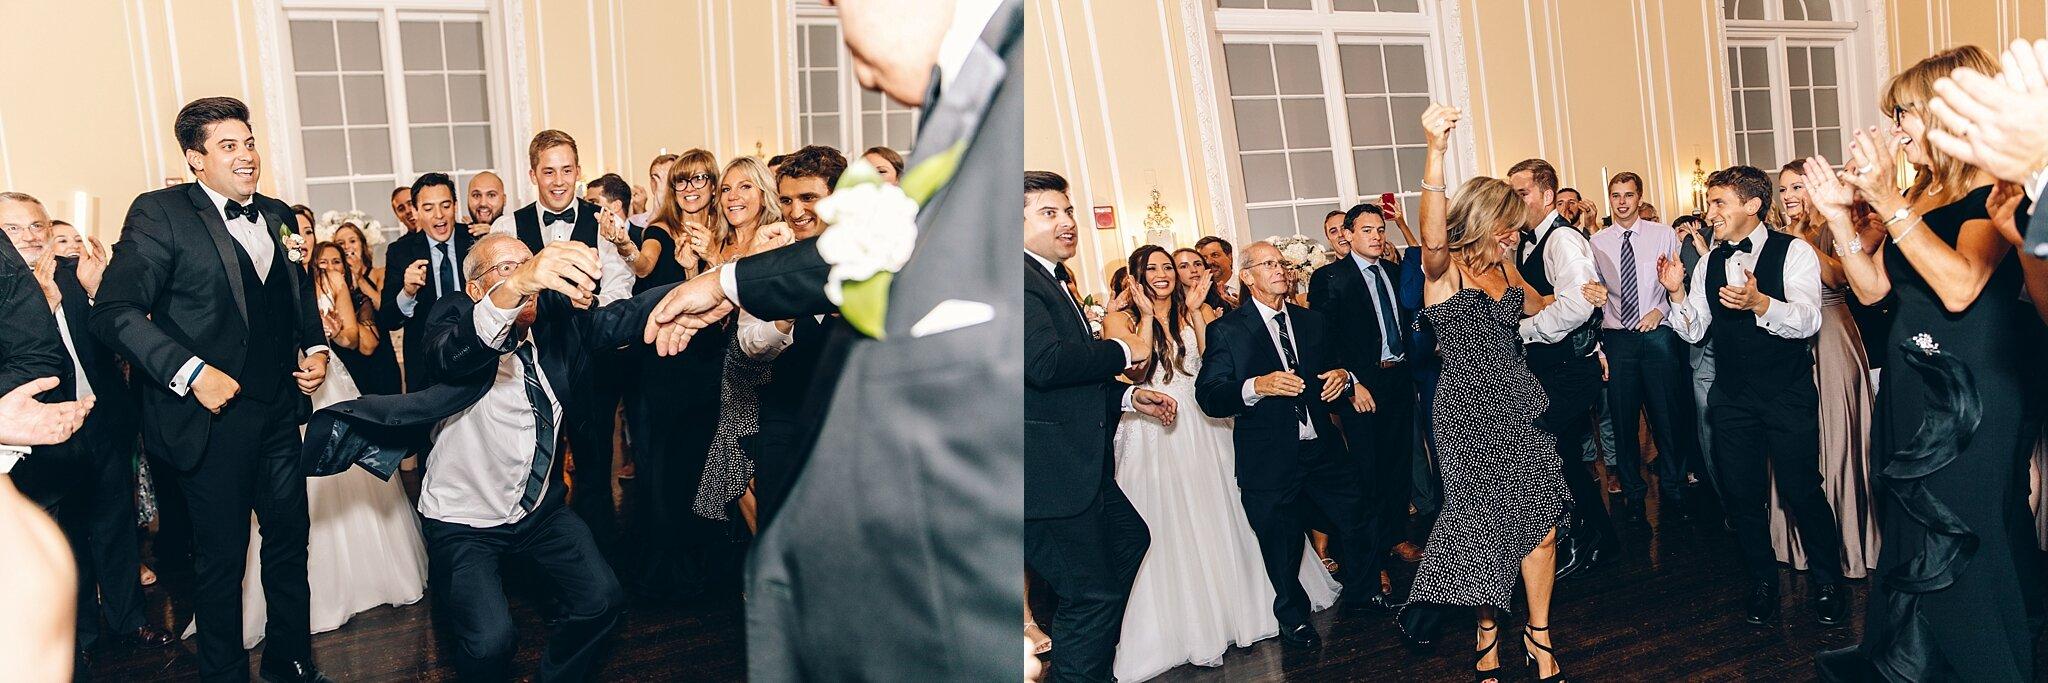 patrick-henry-ballroom-wedding-roanoke_0544.jpg